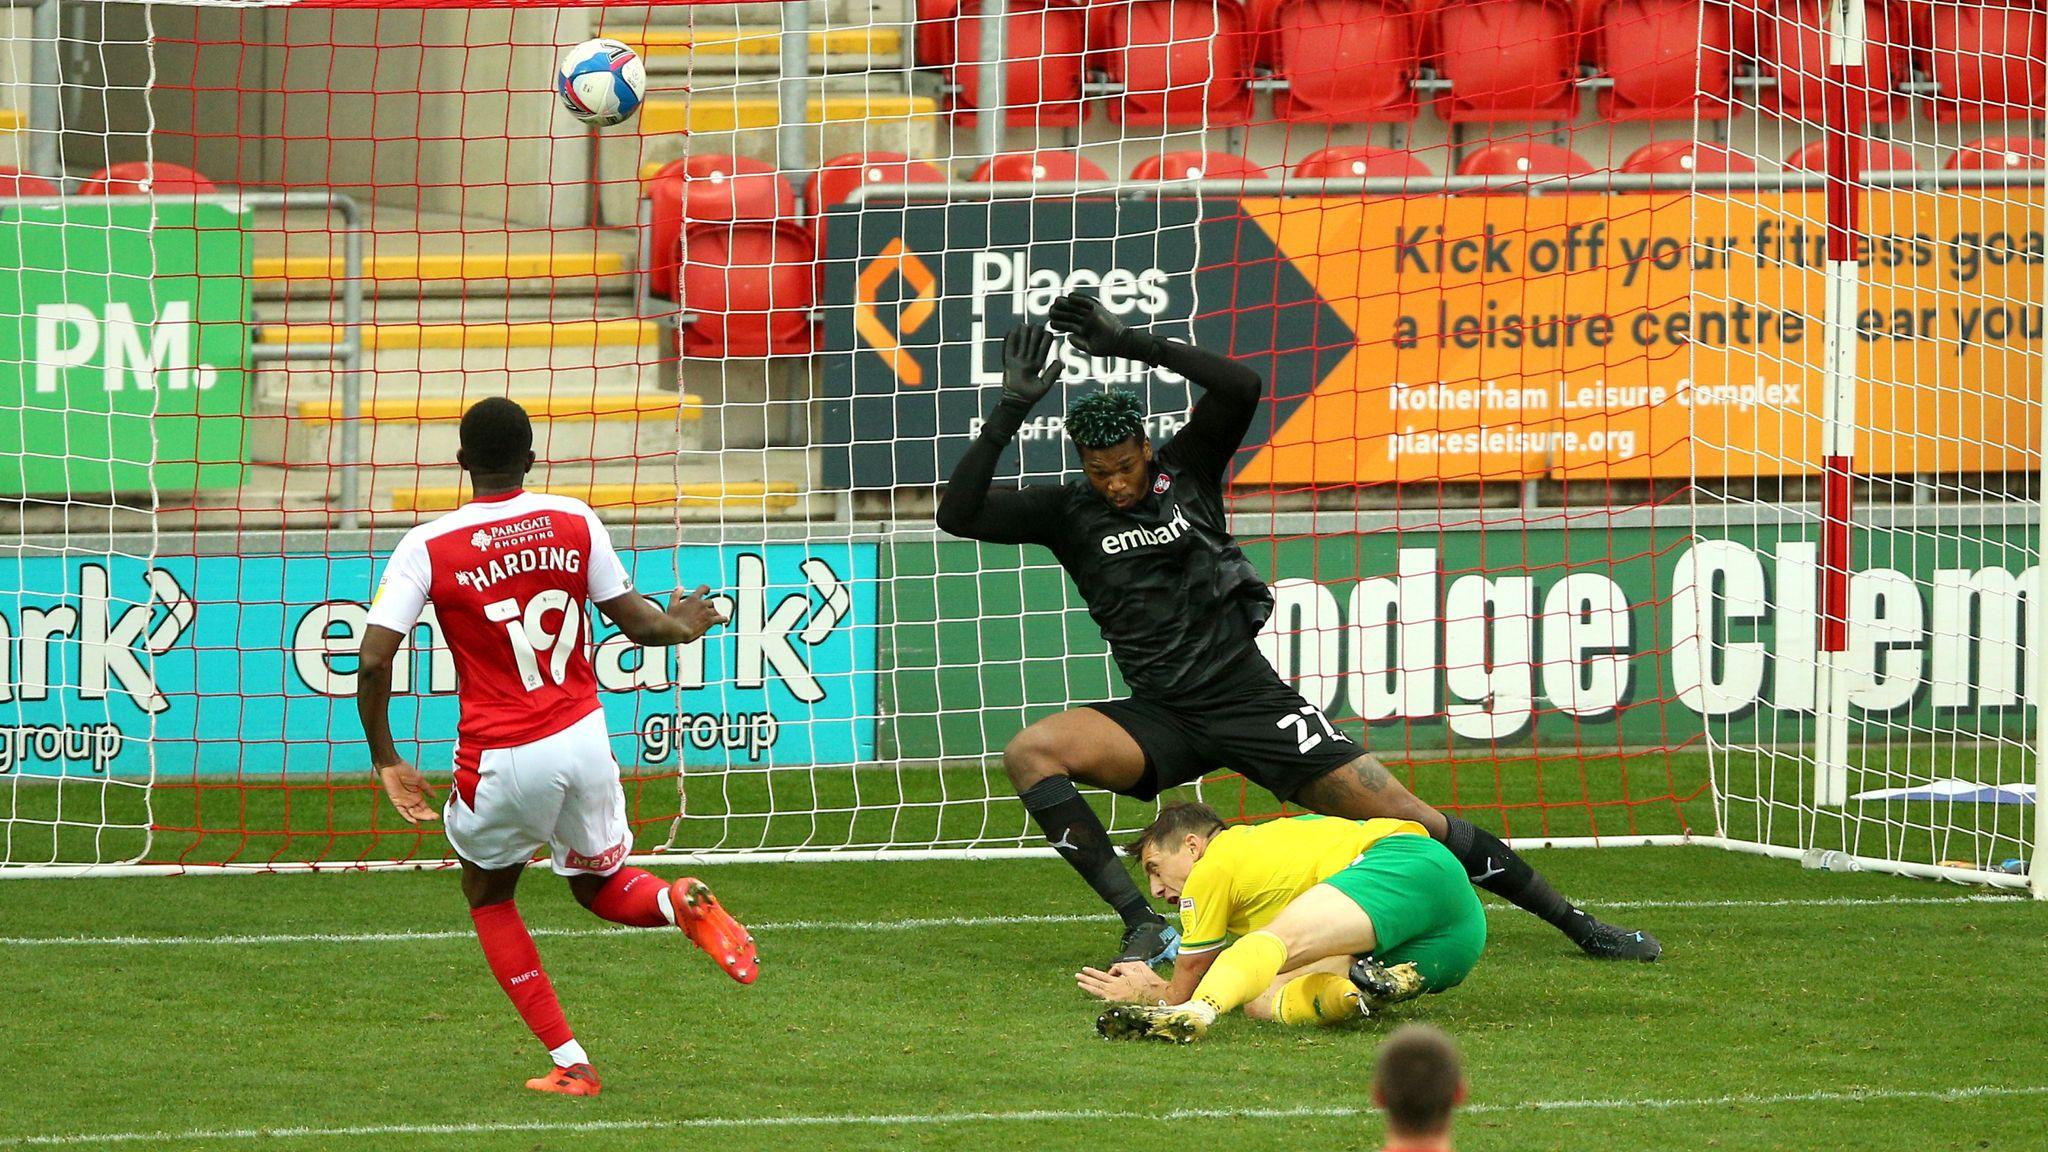 Rotherham 1-2 Norwich: Jordan Hugill hits stoppage-time penalty winner